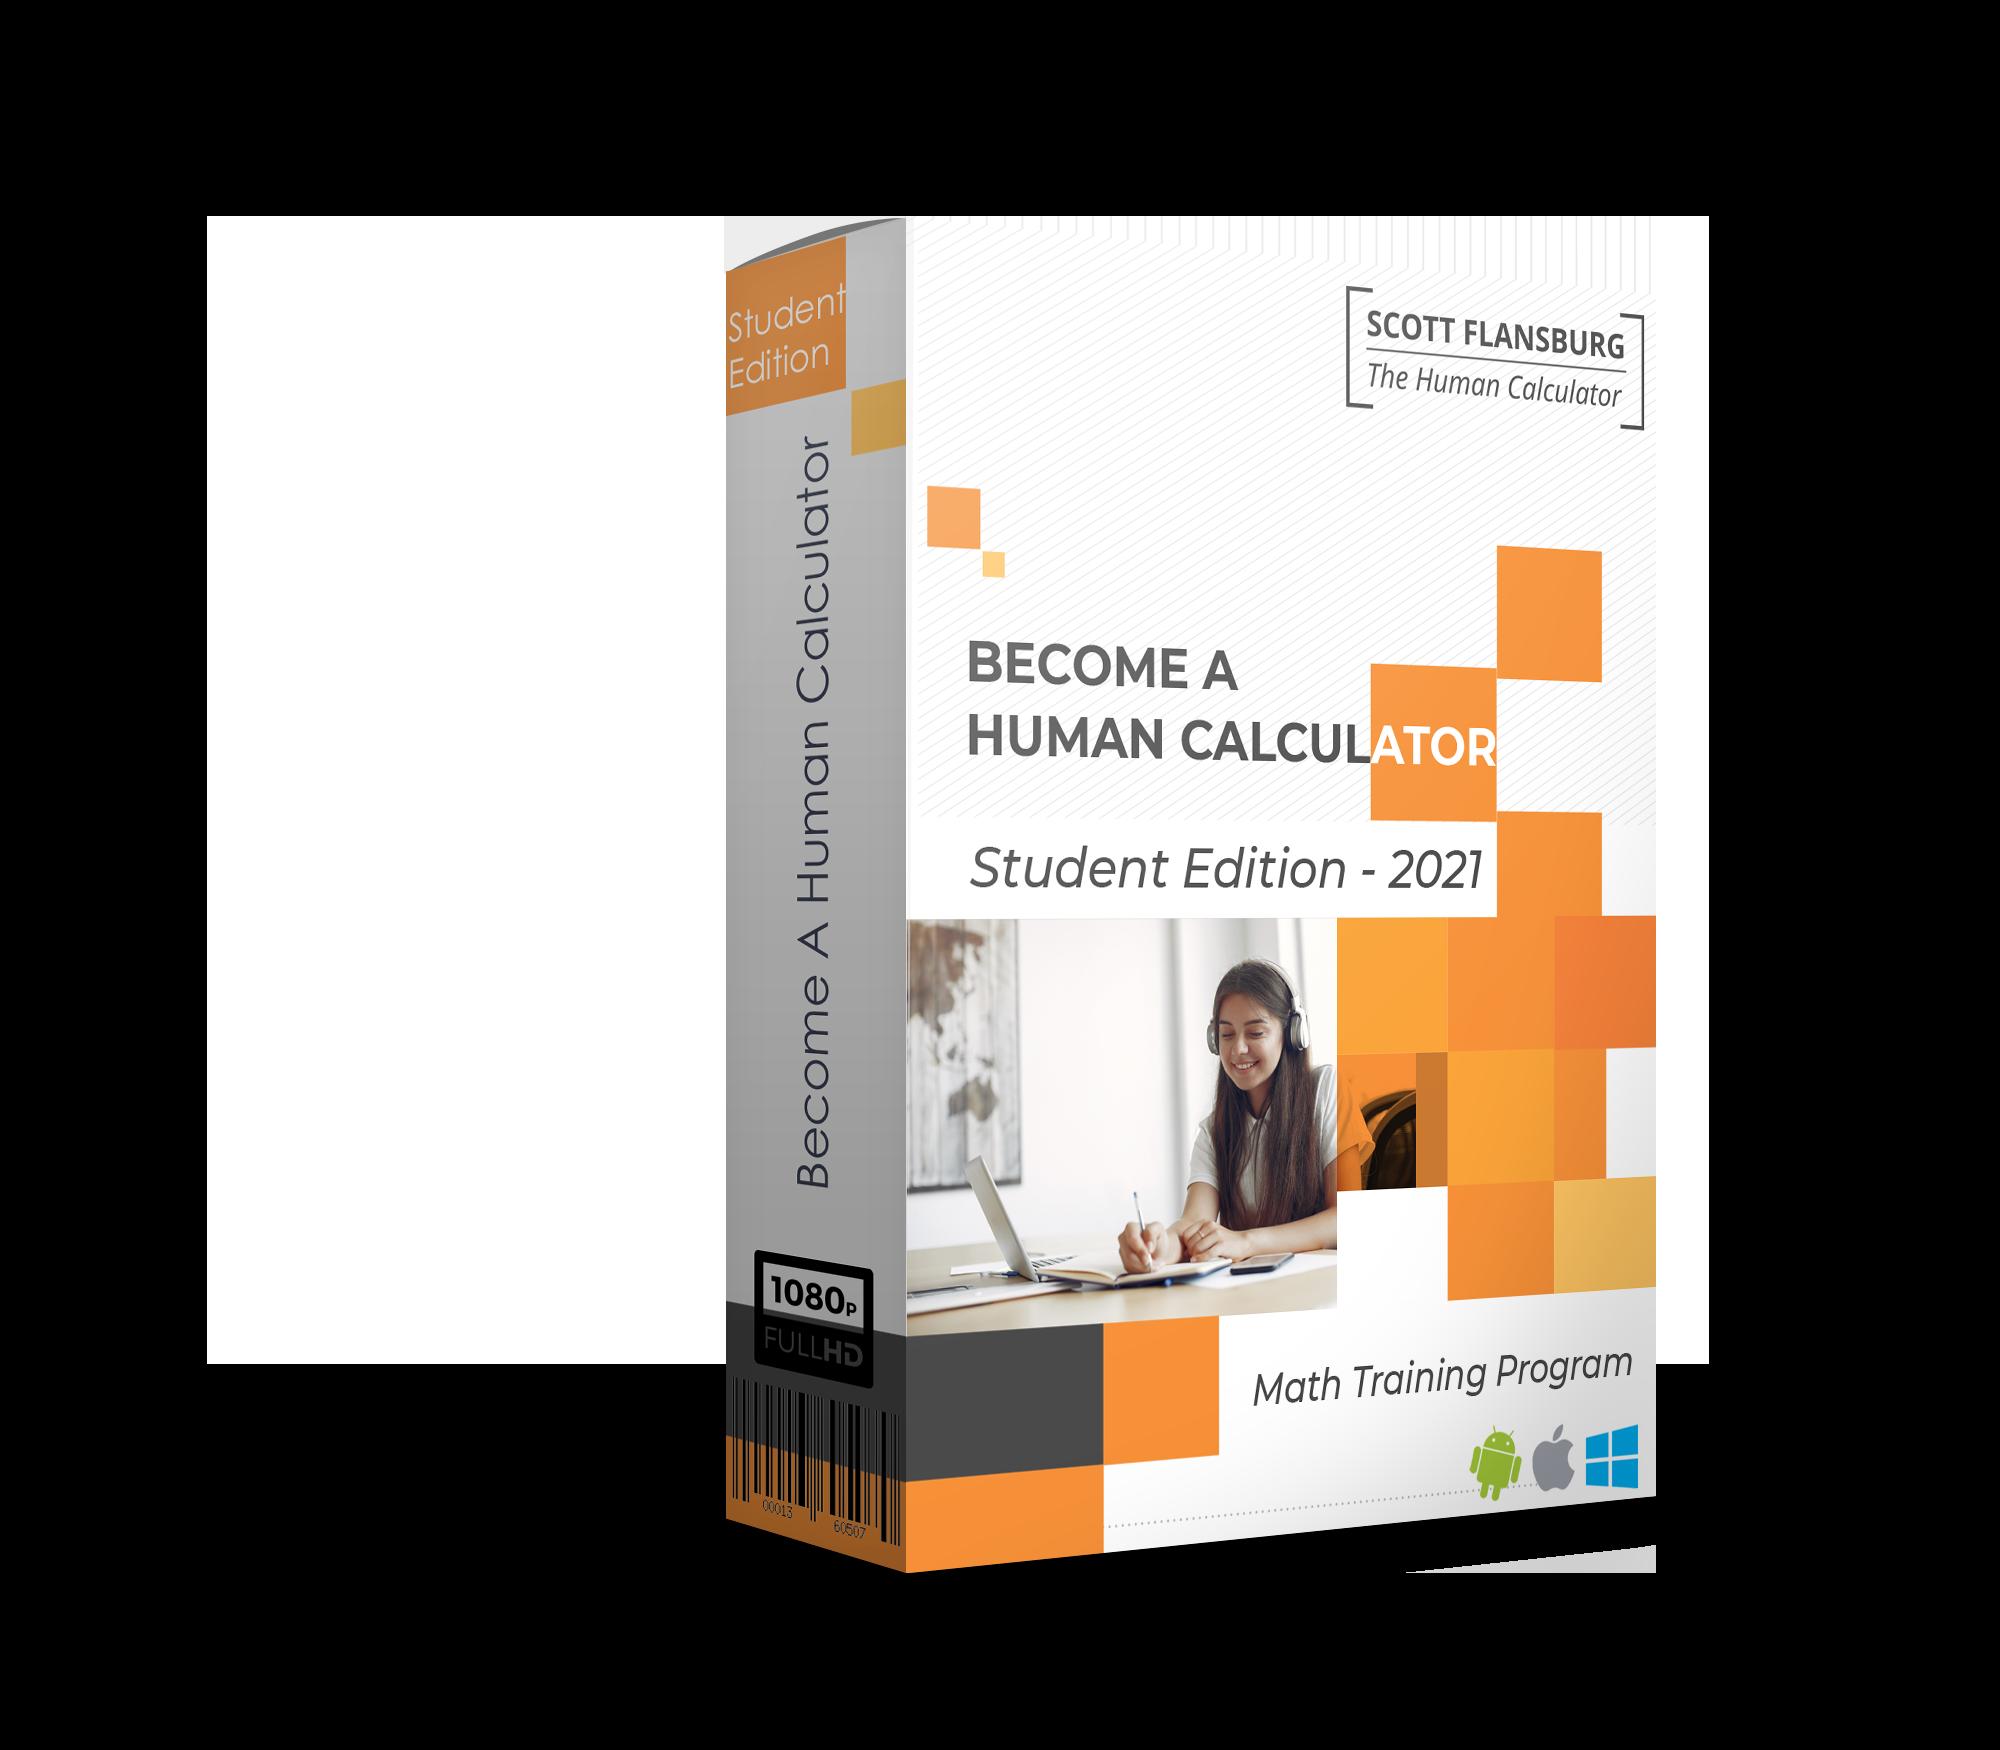 Become A Human Calculator - Student Edition